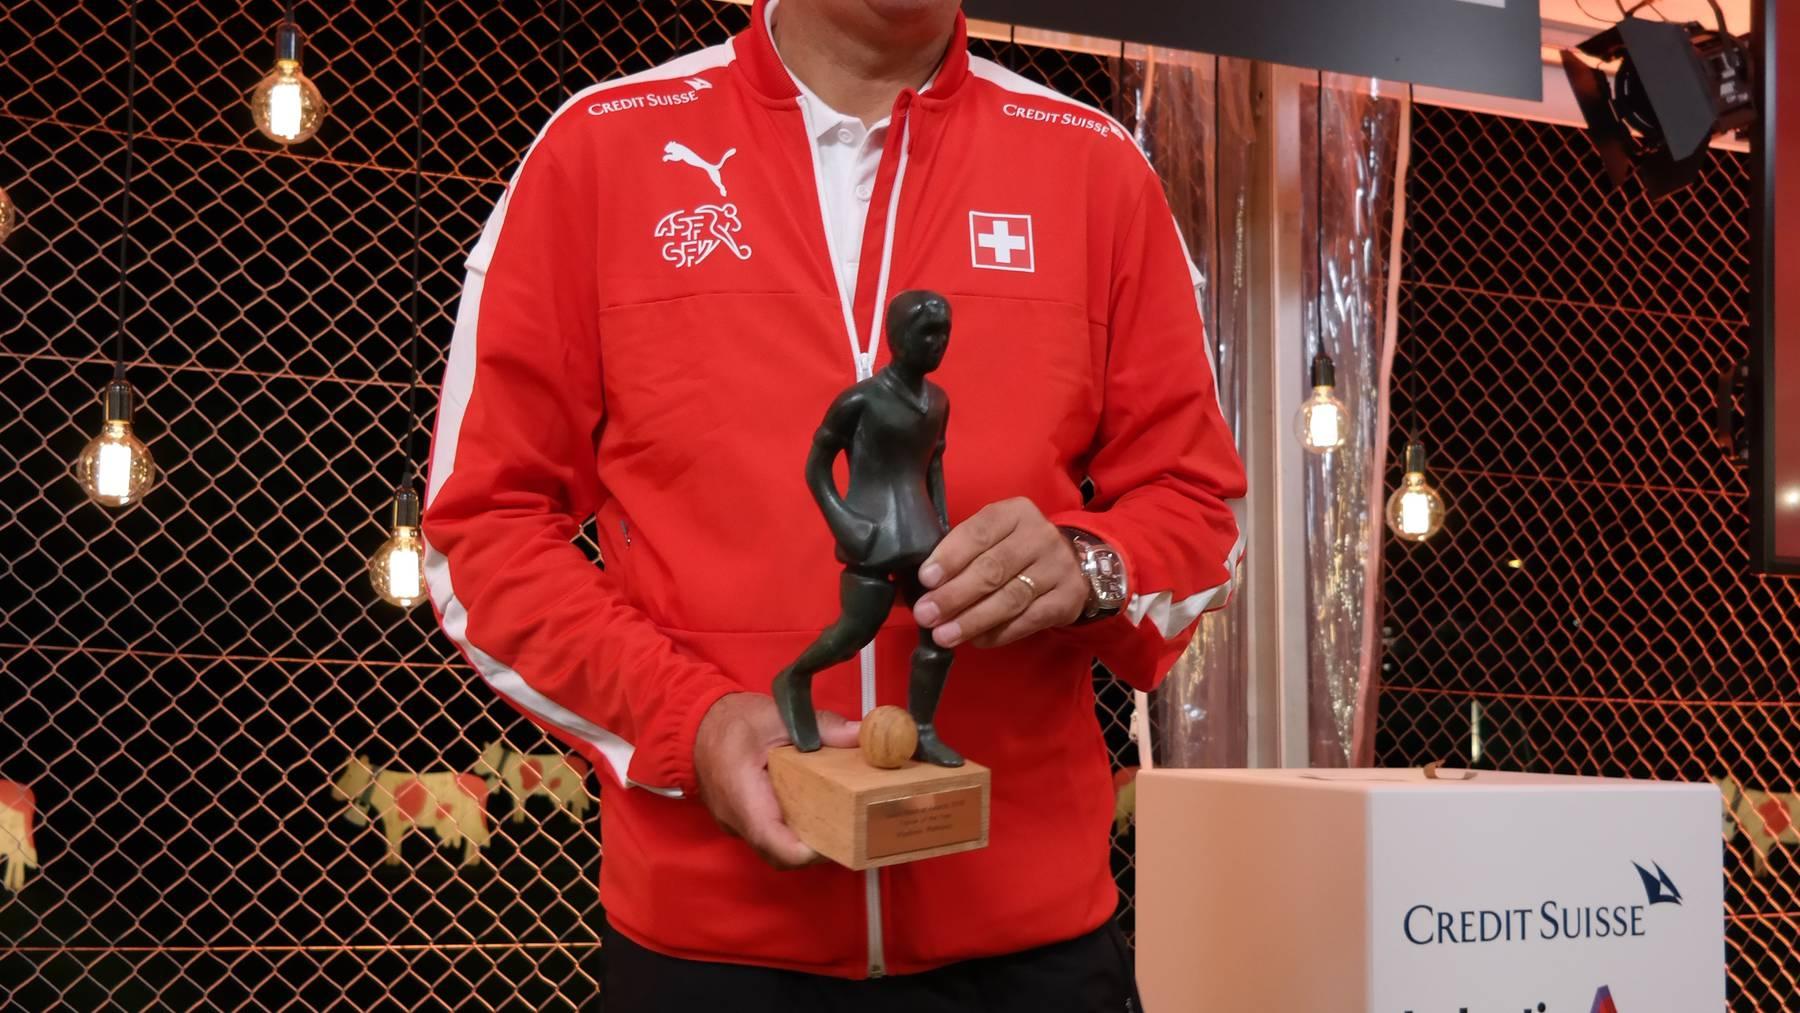 Fussball: WM ohne Admir Mehmedi